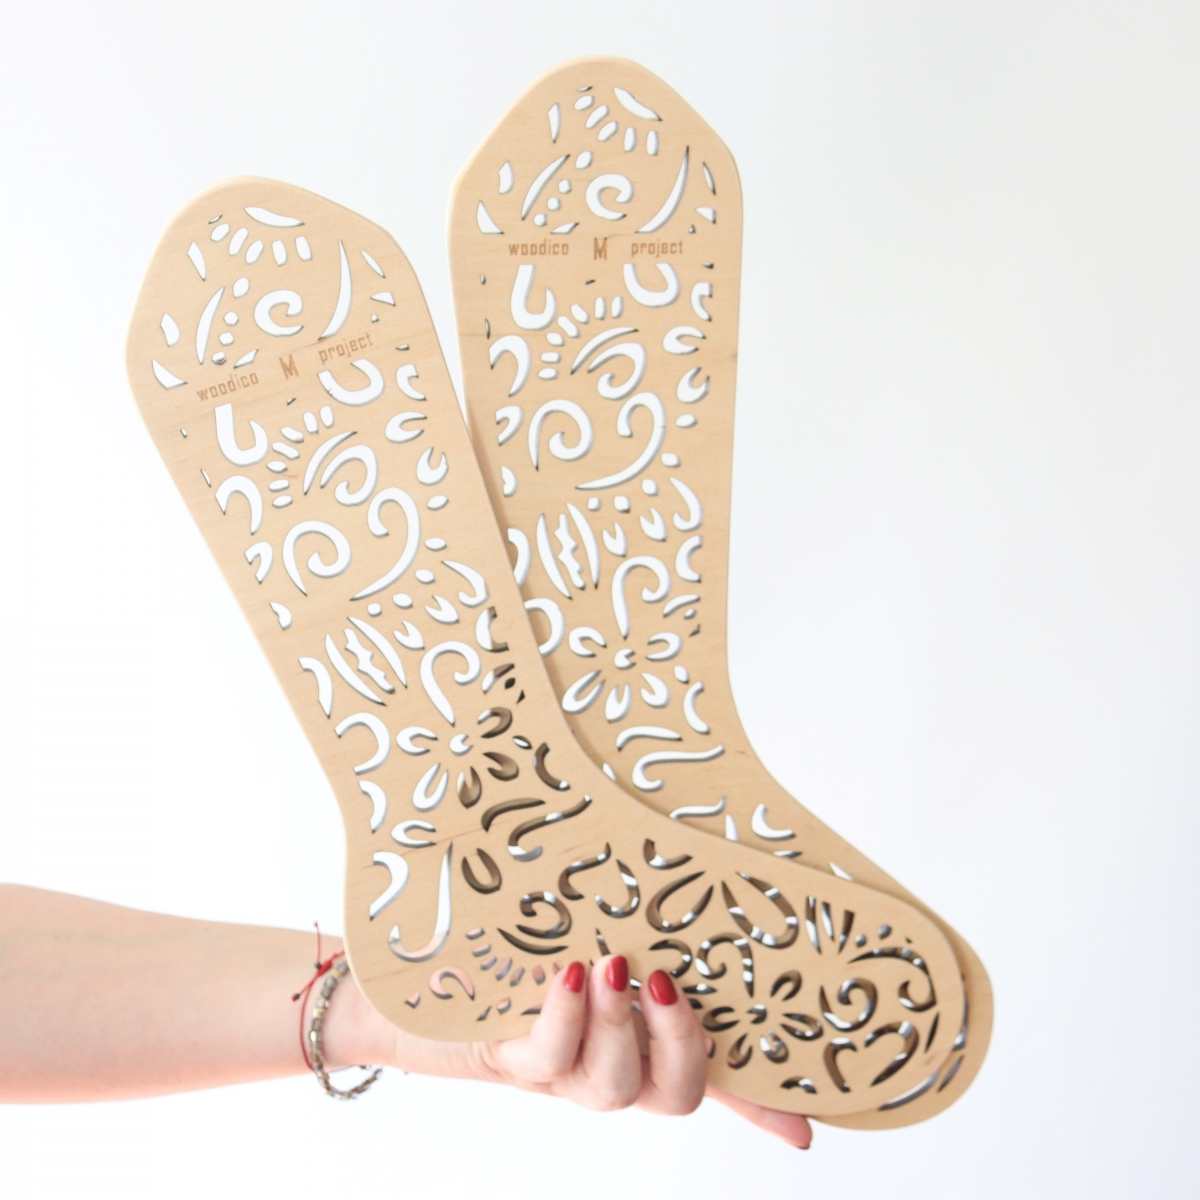 woodico.pro wooden sock blockers seeds 8 1200x1200 - Wooden sock blockers / Seeds